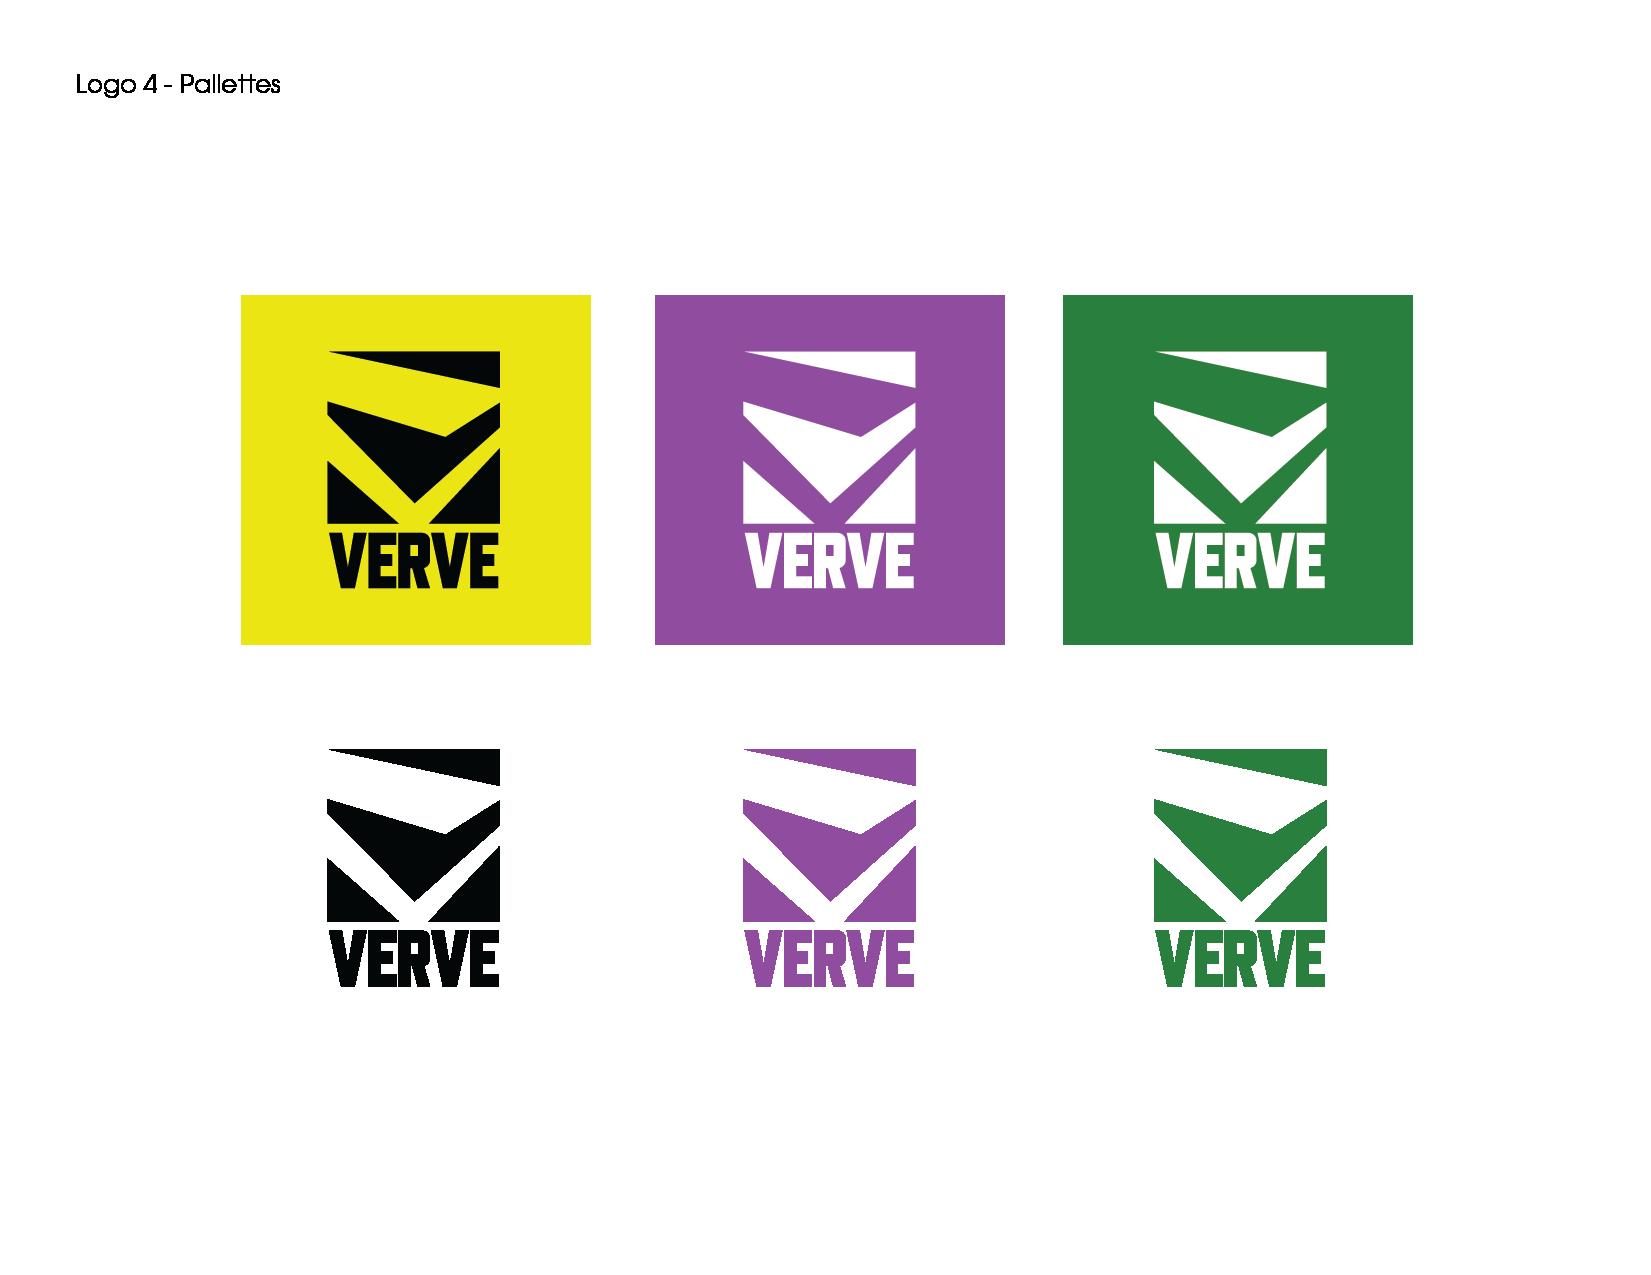 VRV_Logos_Stage_1_Round2-20.png